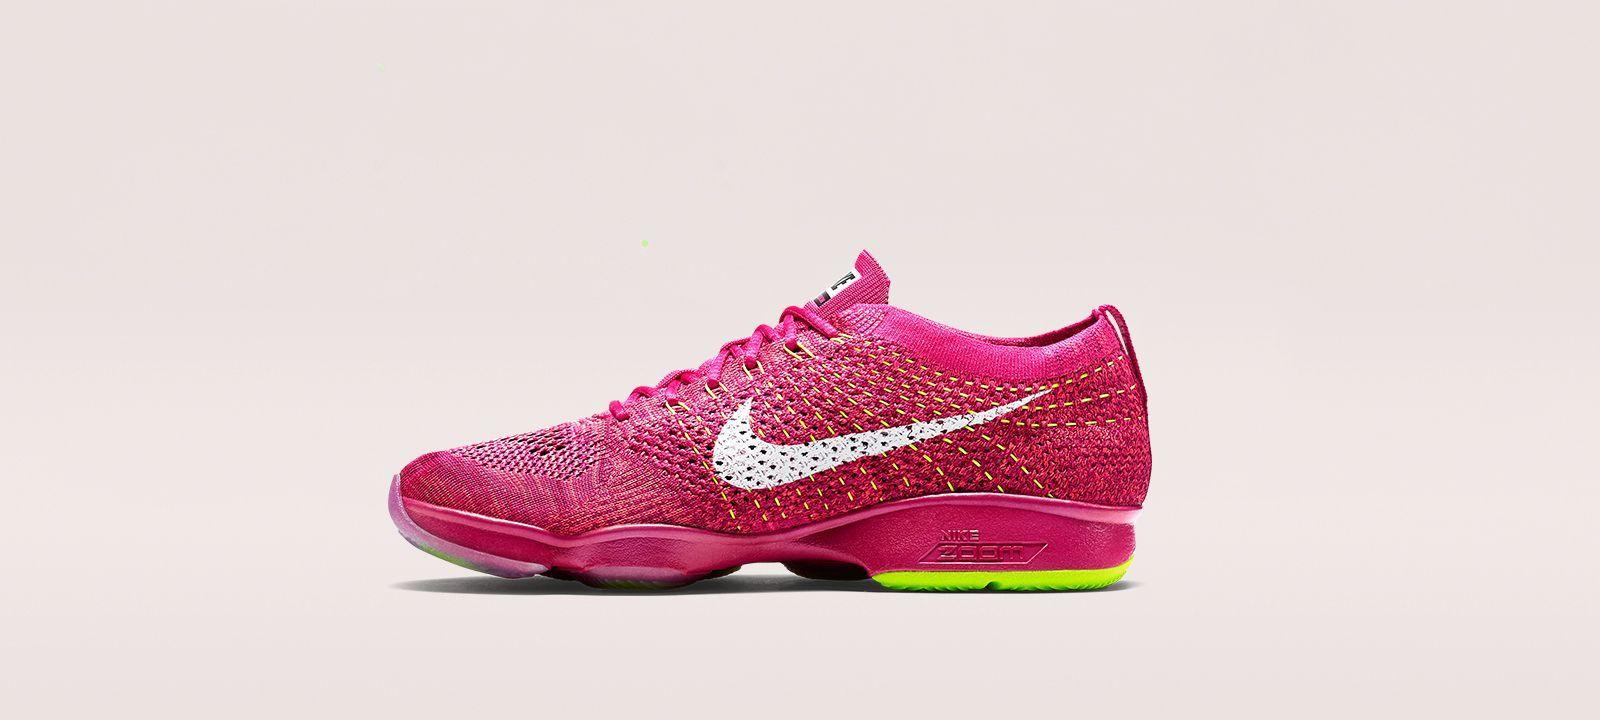 Turbob On Free Running Save Flyknit ShoeShox Womens Nike erdCBWox